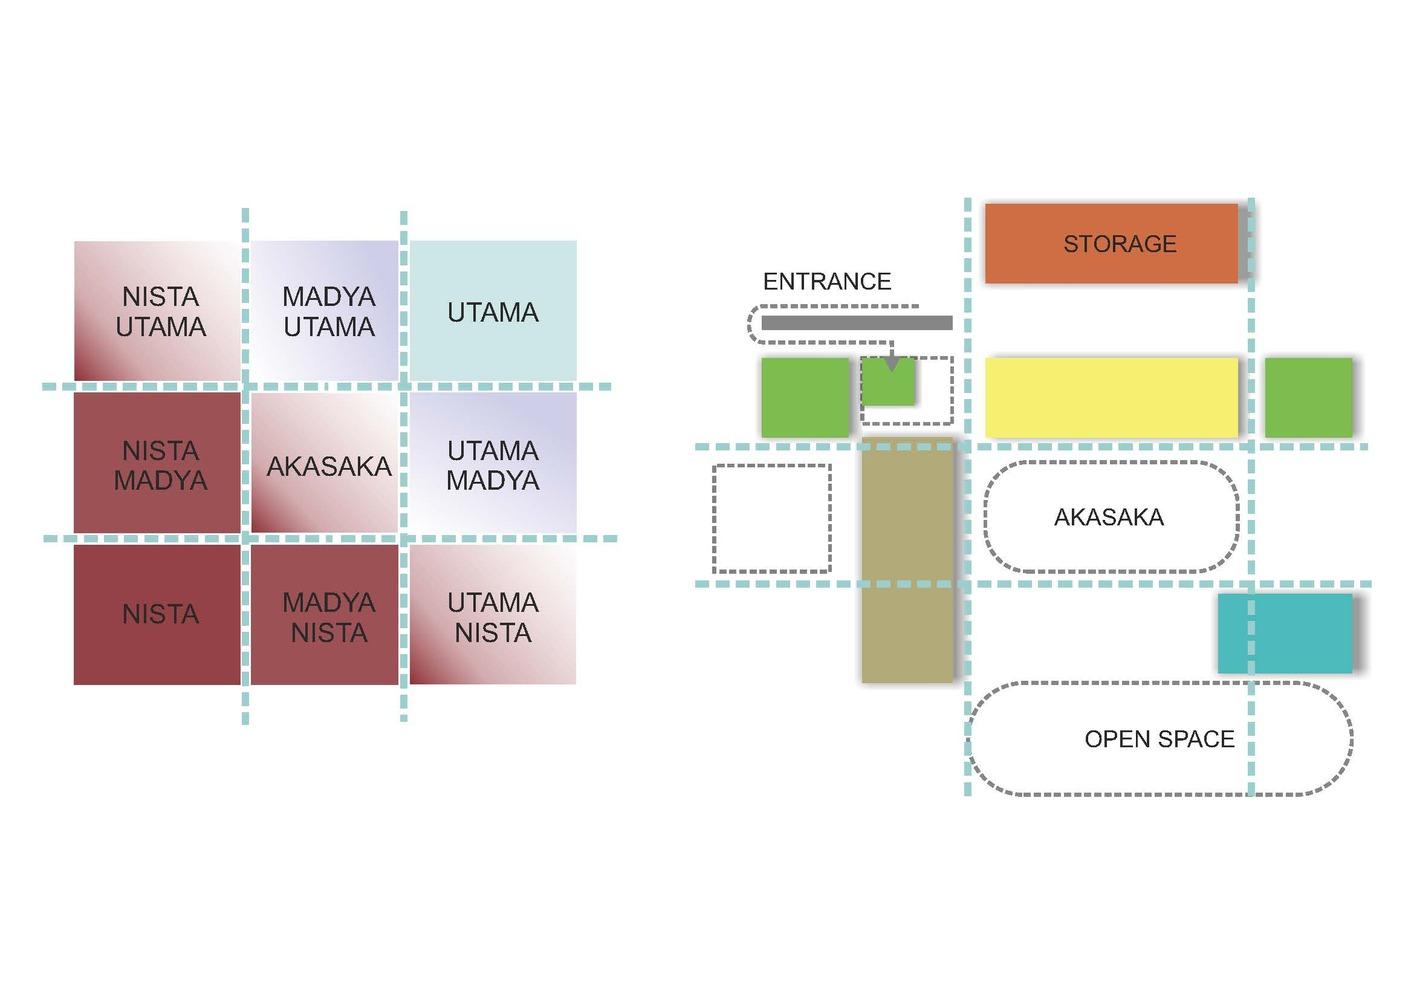 Konsep utama hunian dengan zonasi yang terinspirasi oleh Tri Mandala (Sumber: archdaily.com)